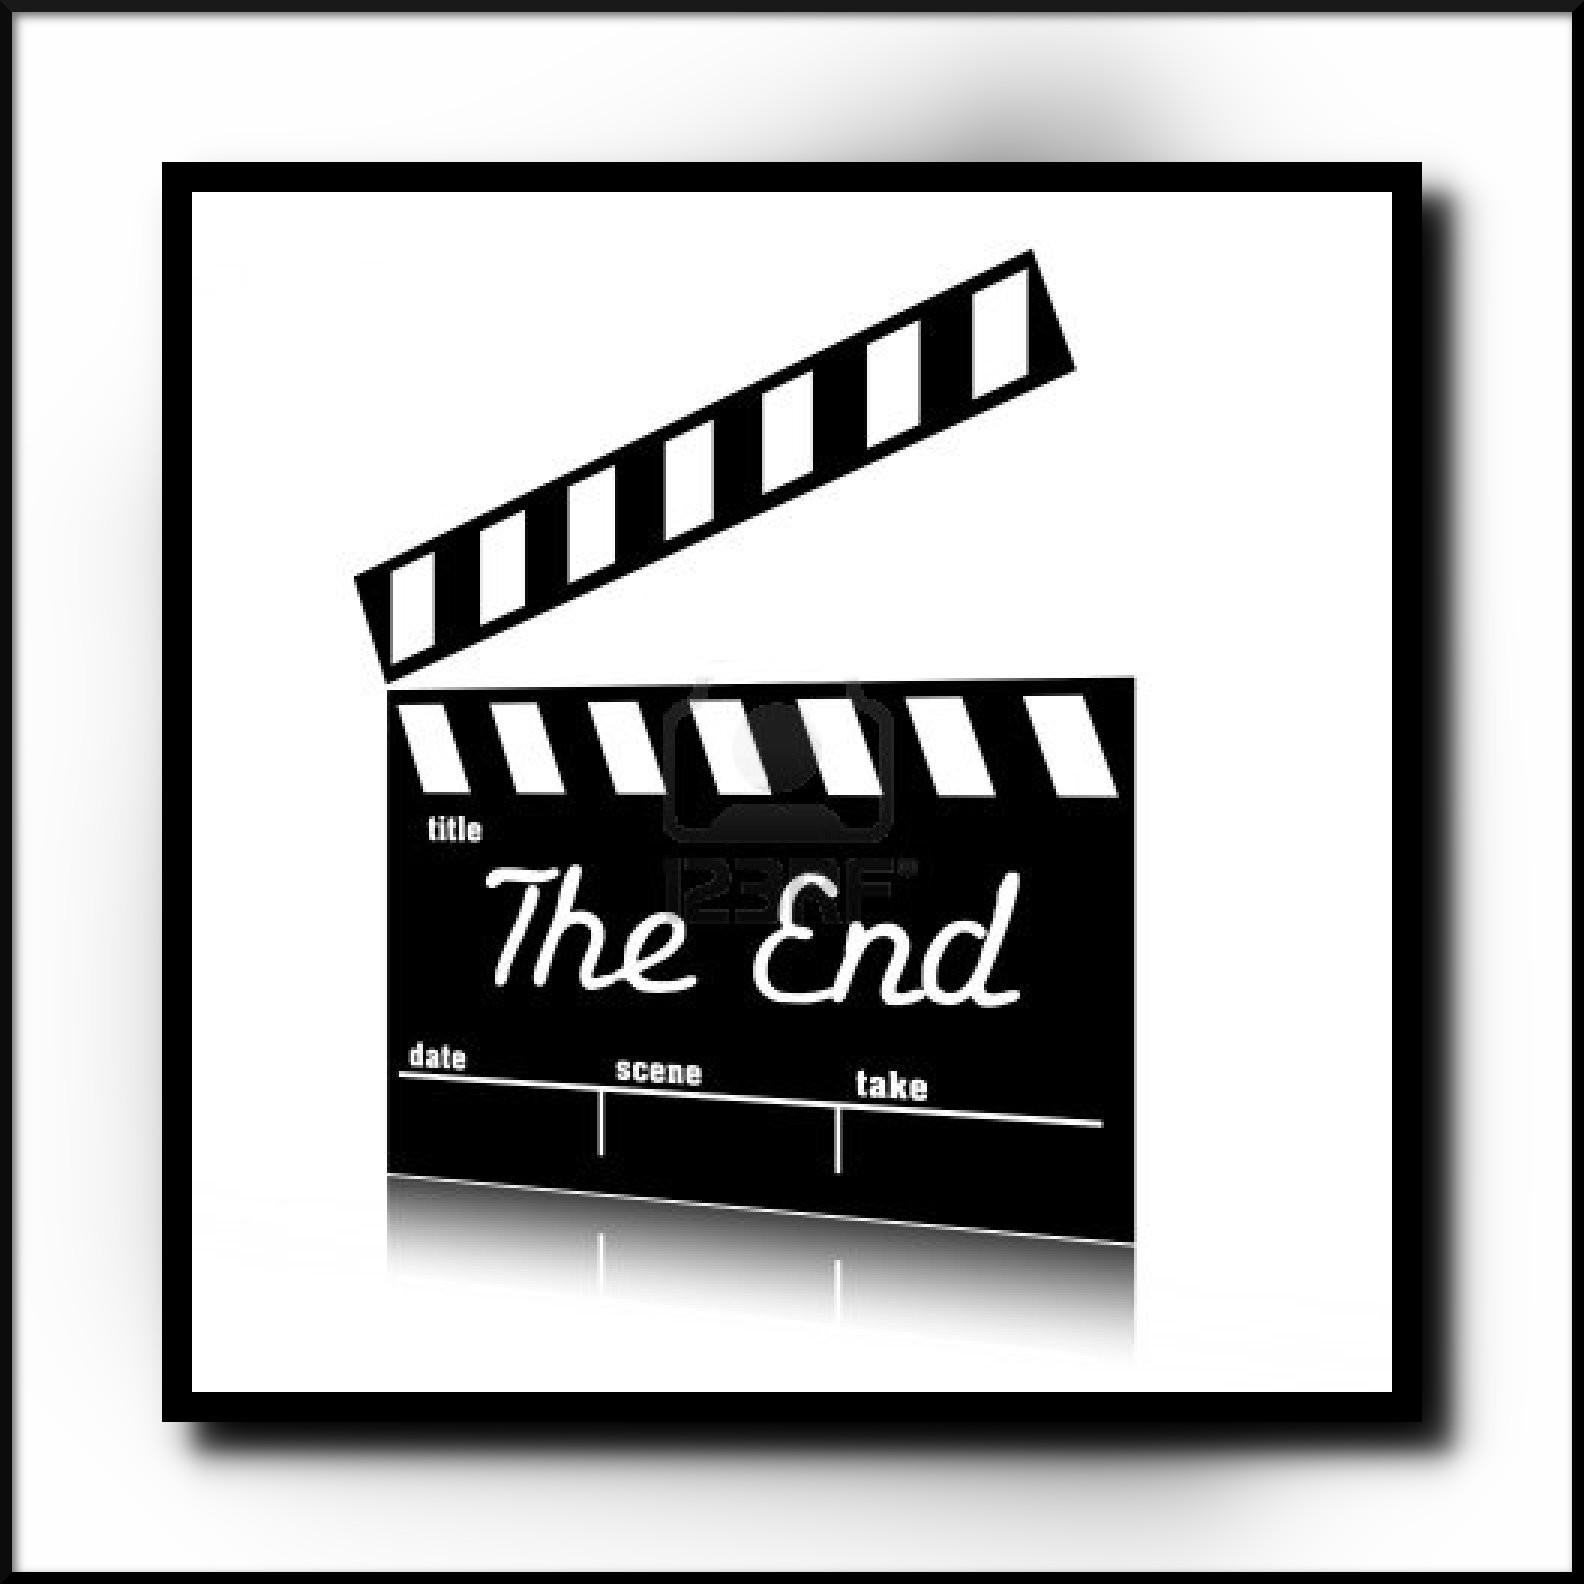 movie theater building clipart cinema clipart movie clip art rh mysteryoftheiniquity com movie film clip art free movie film clipart free